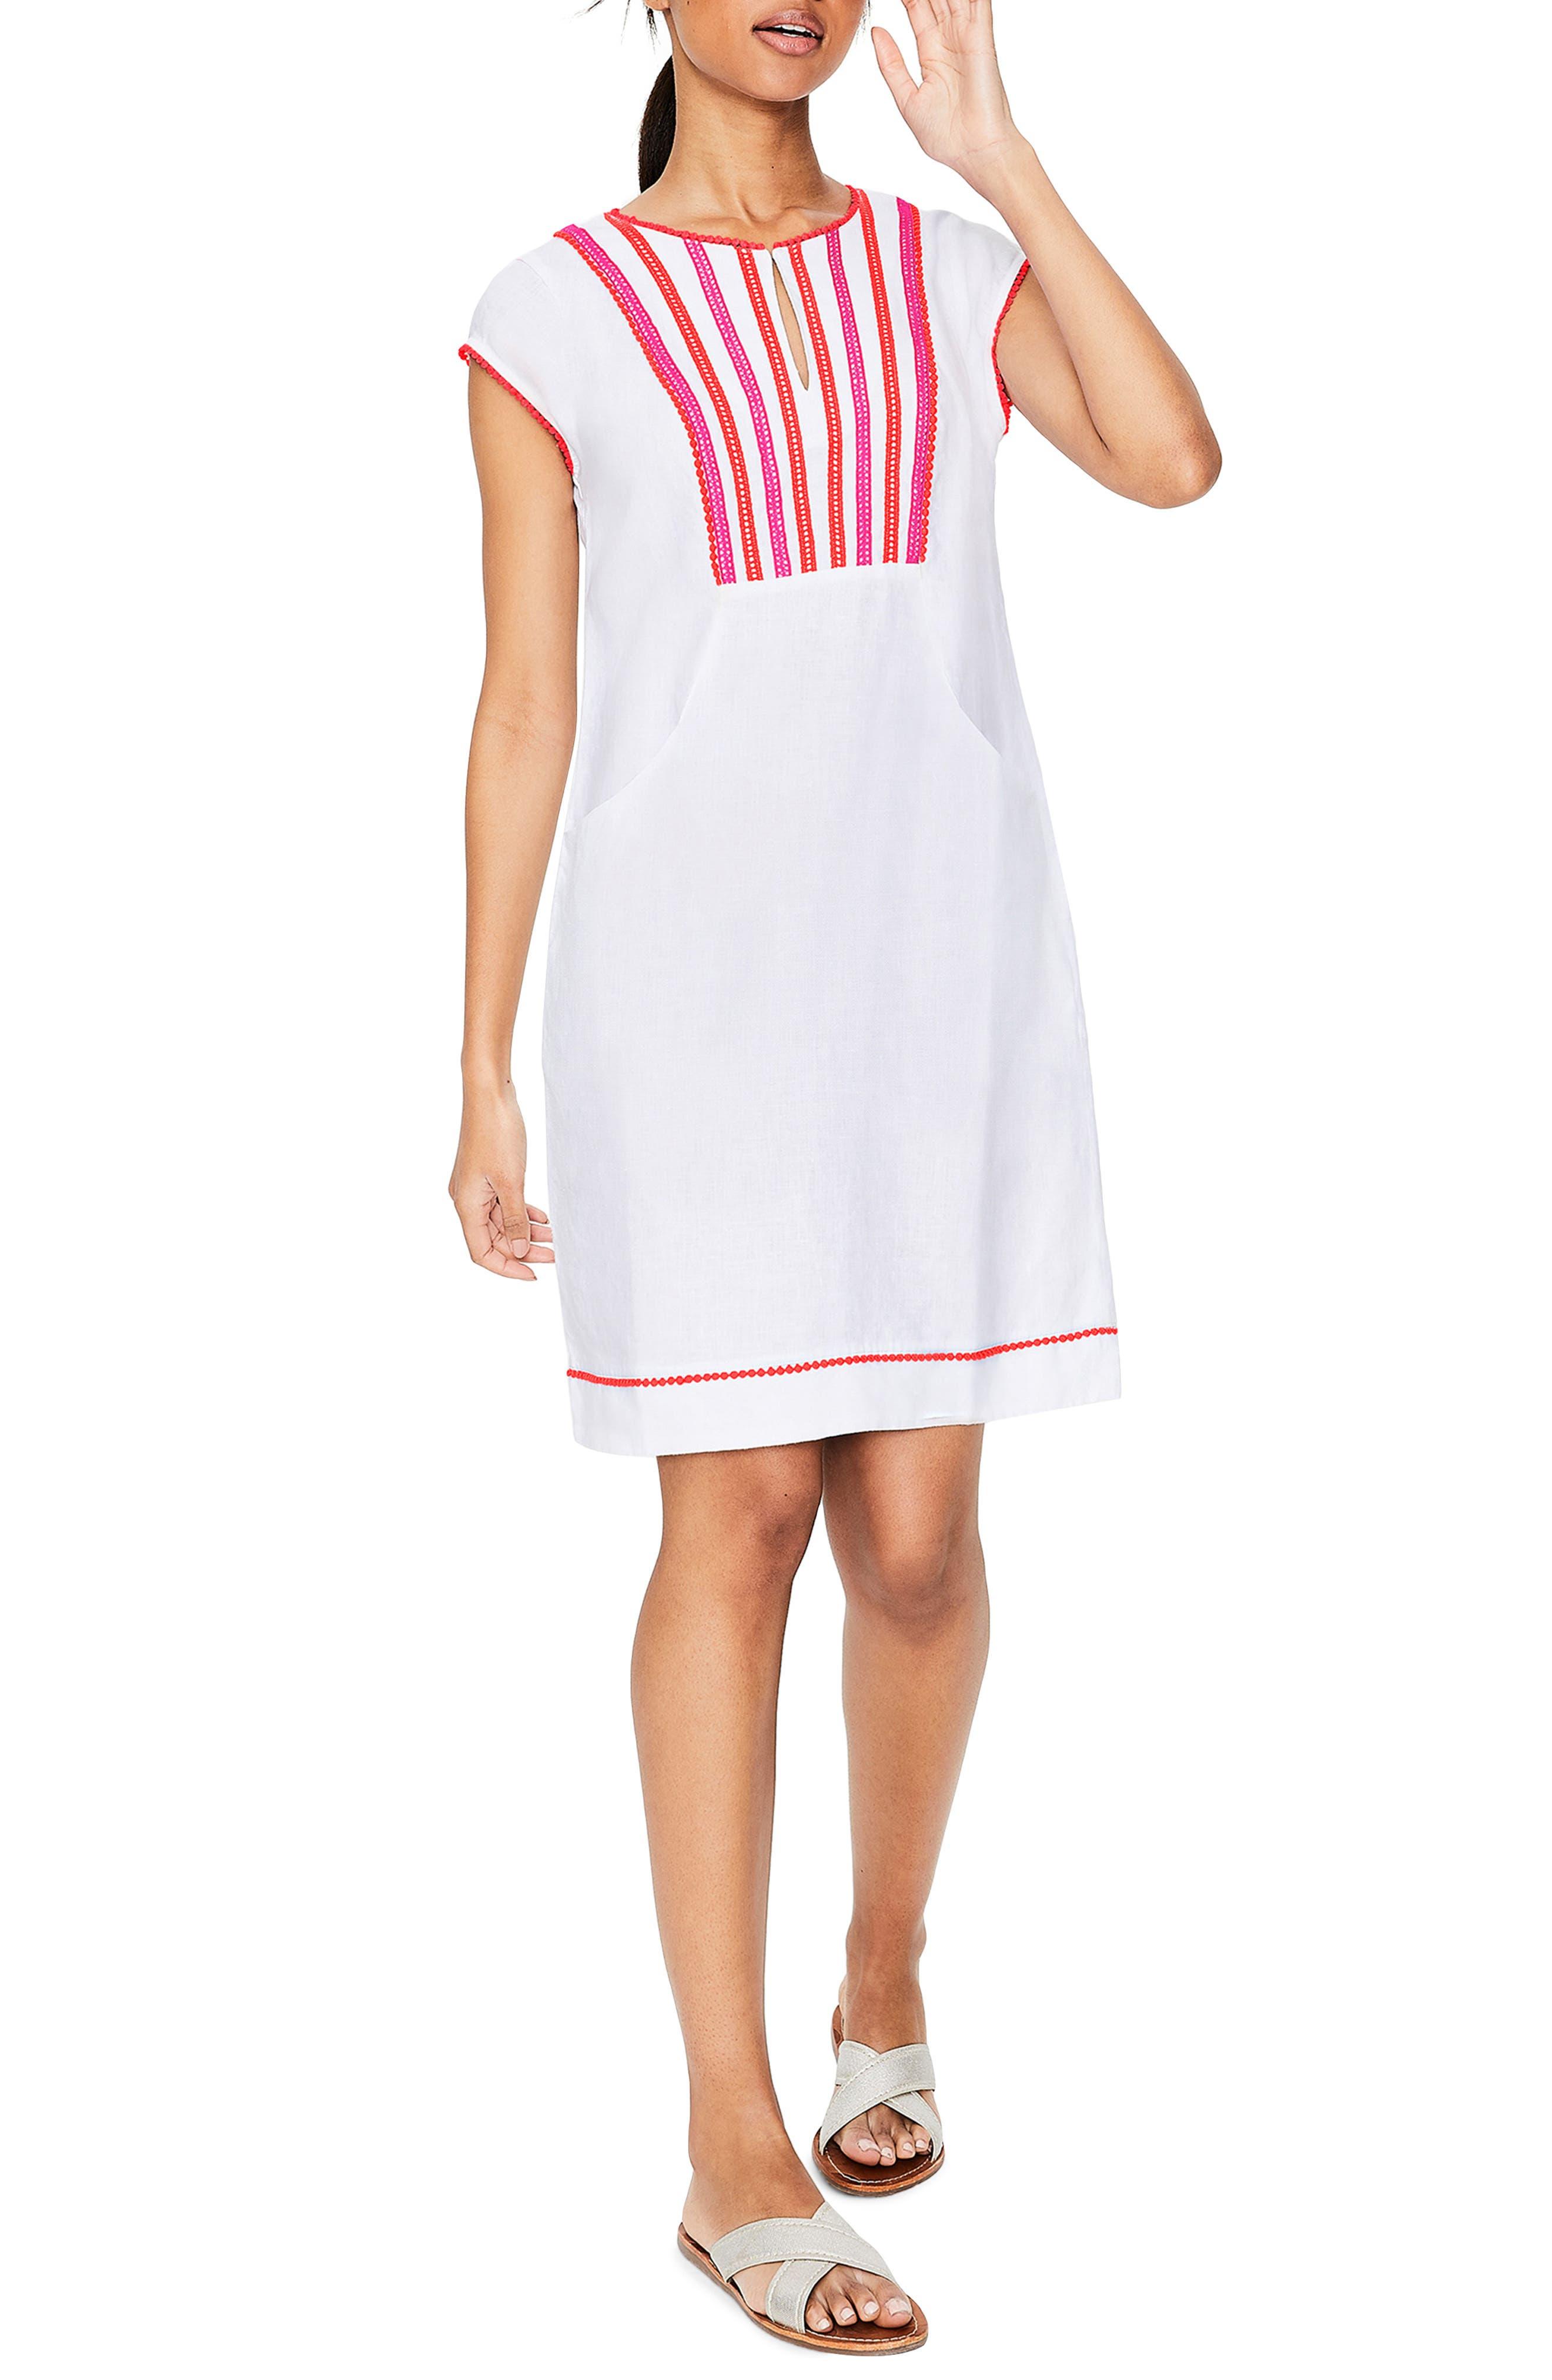 Petite Boden Jessica Linen Dress, White